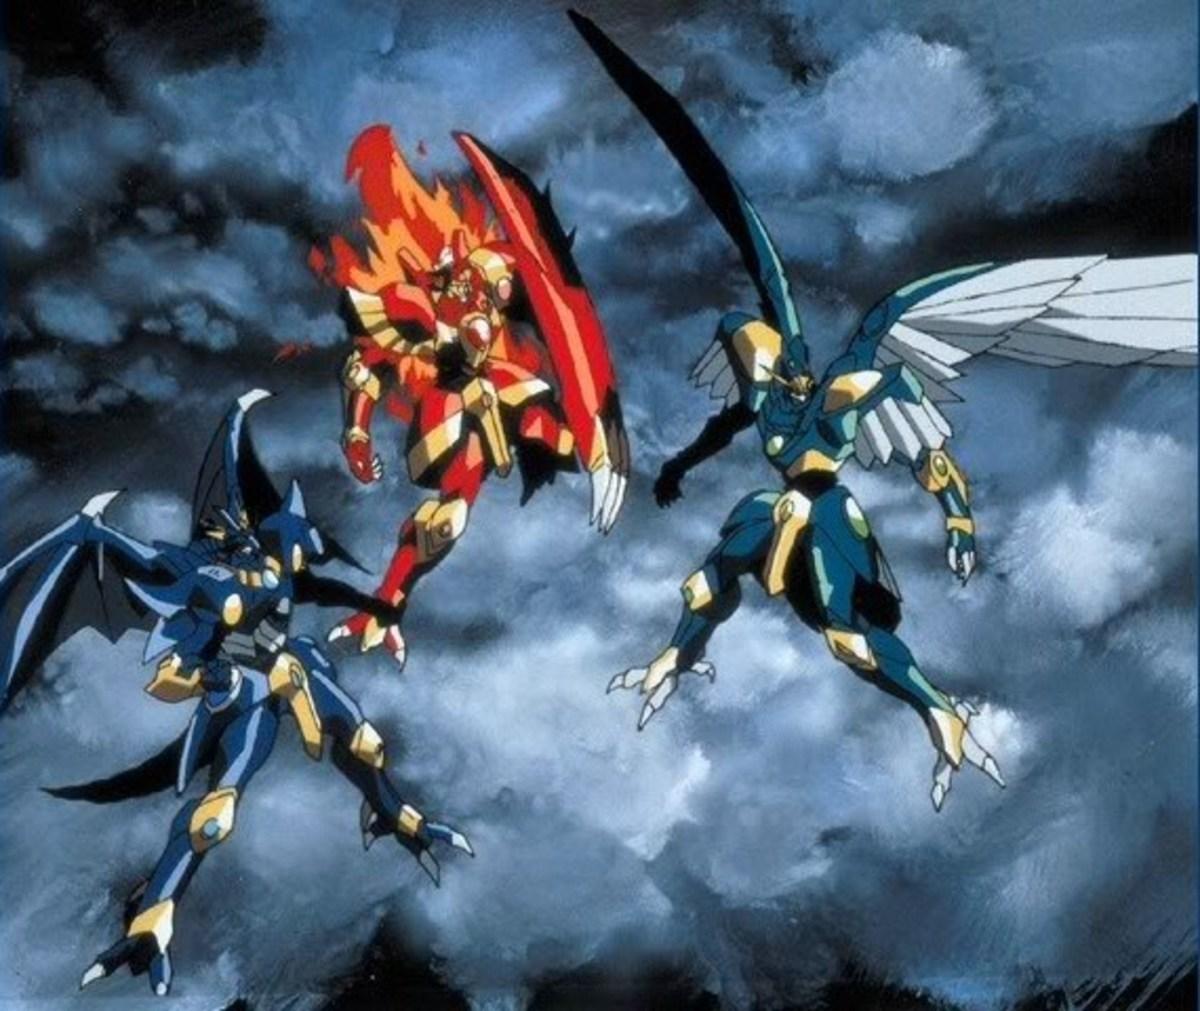 The Mashins of Magic Knight Rayearth.